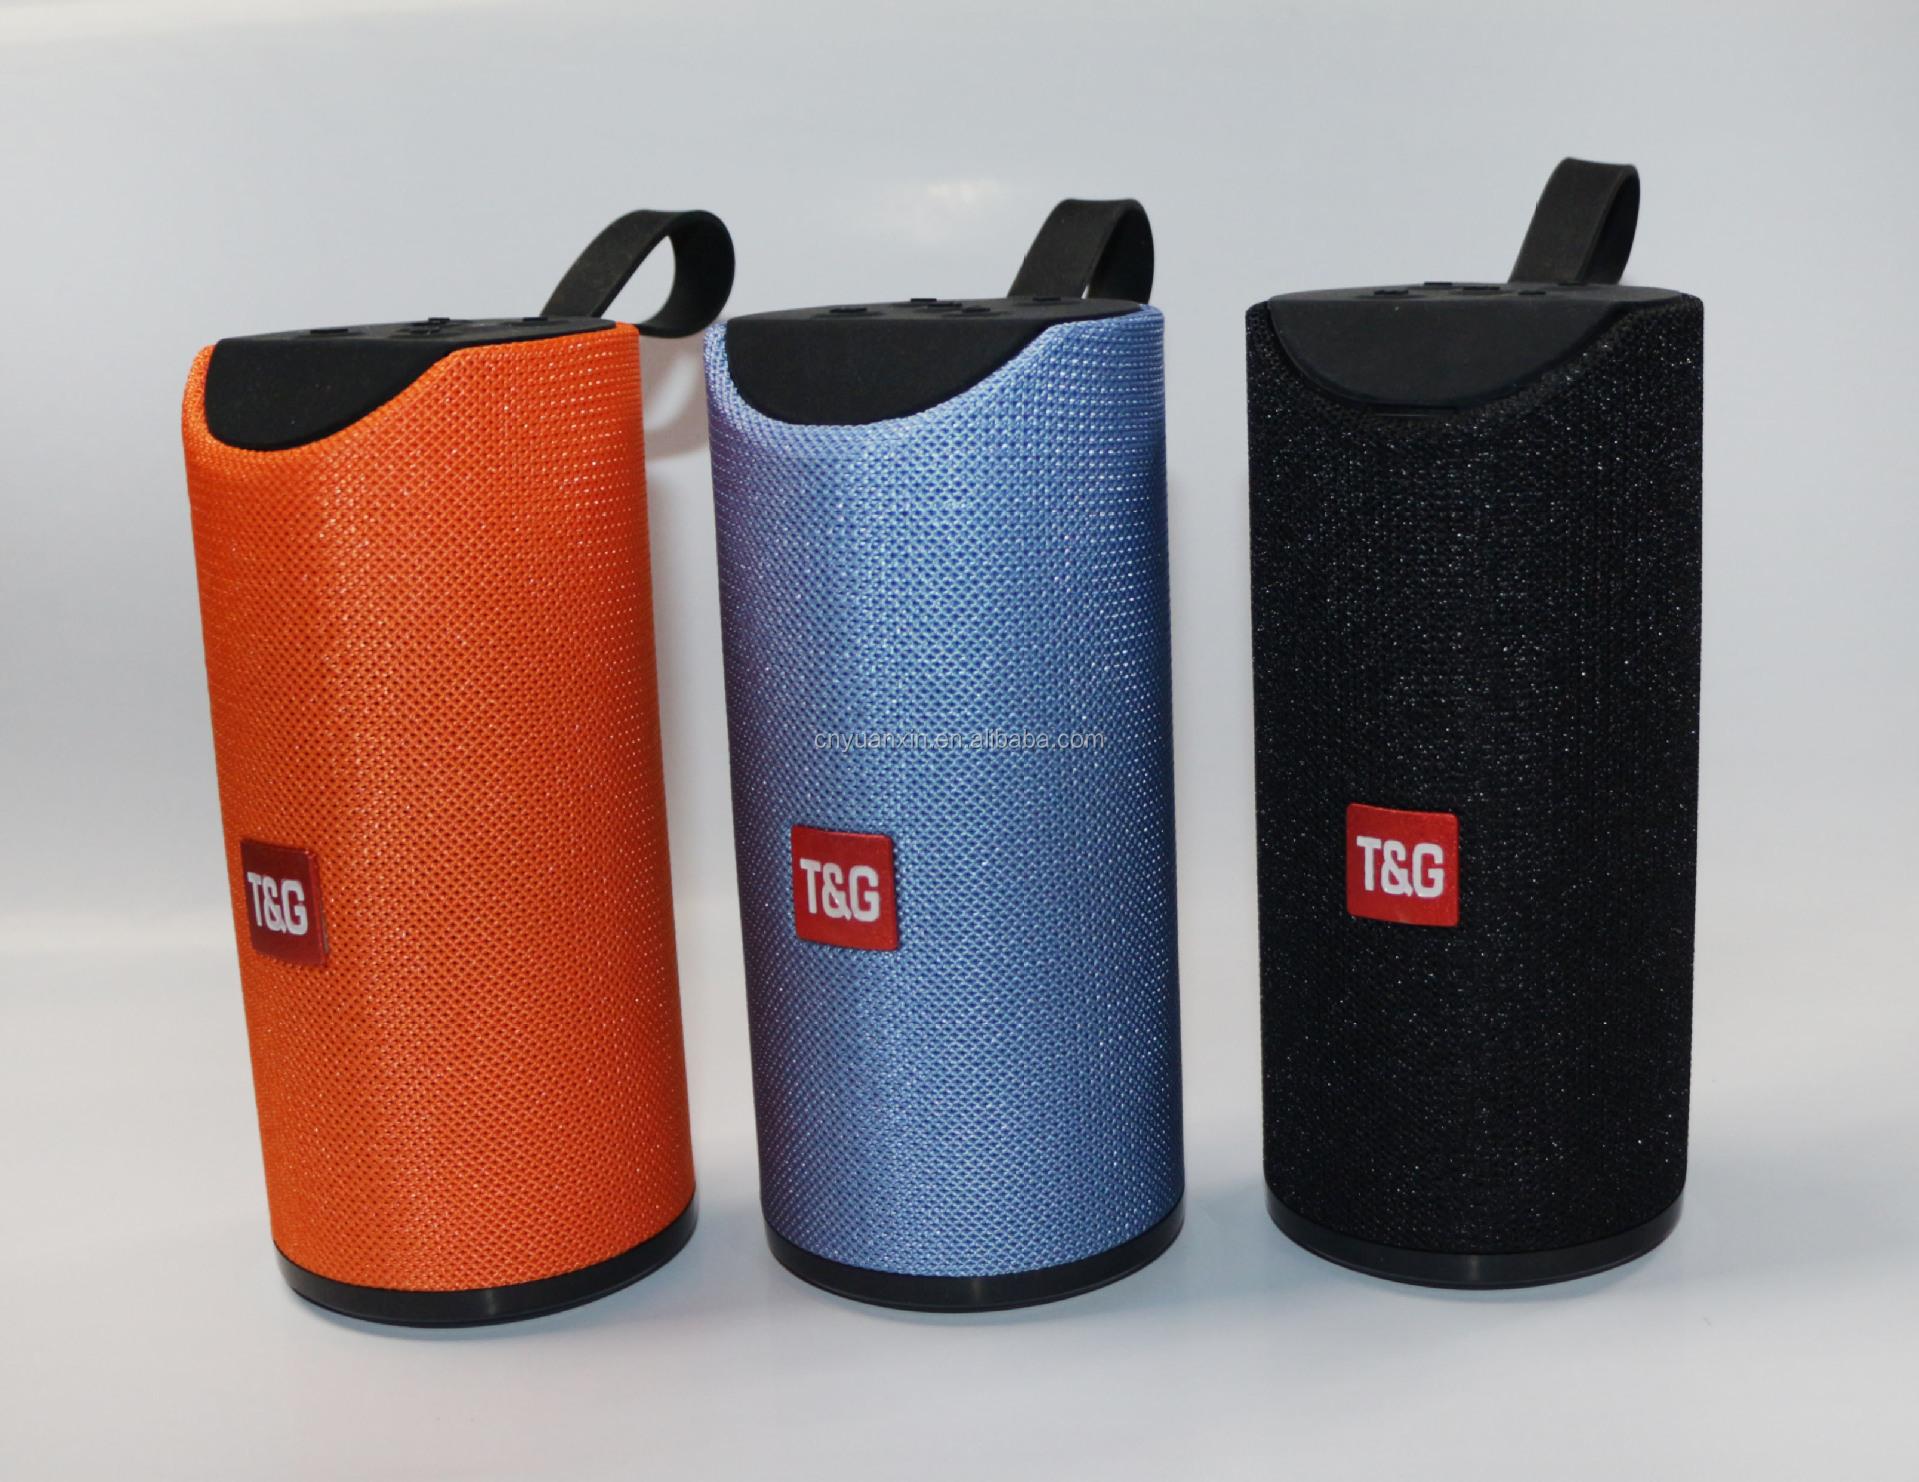 Tg113 Water Proof Blue Tooth Camping Mini Speaker - Buy Portable Underwater  Speakers,Tg113,Hot Selling Speaker Product on Alibaba com